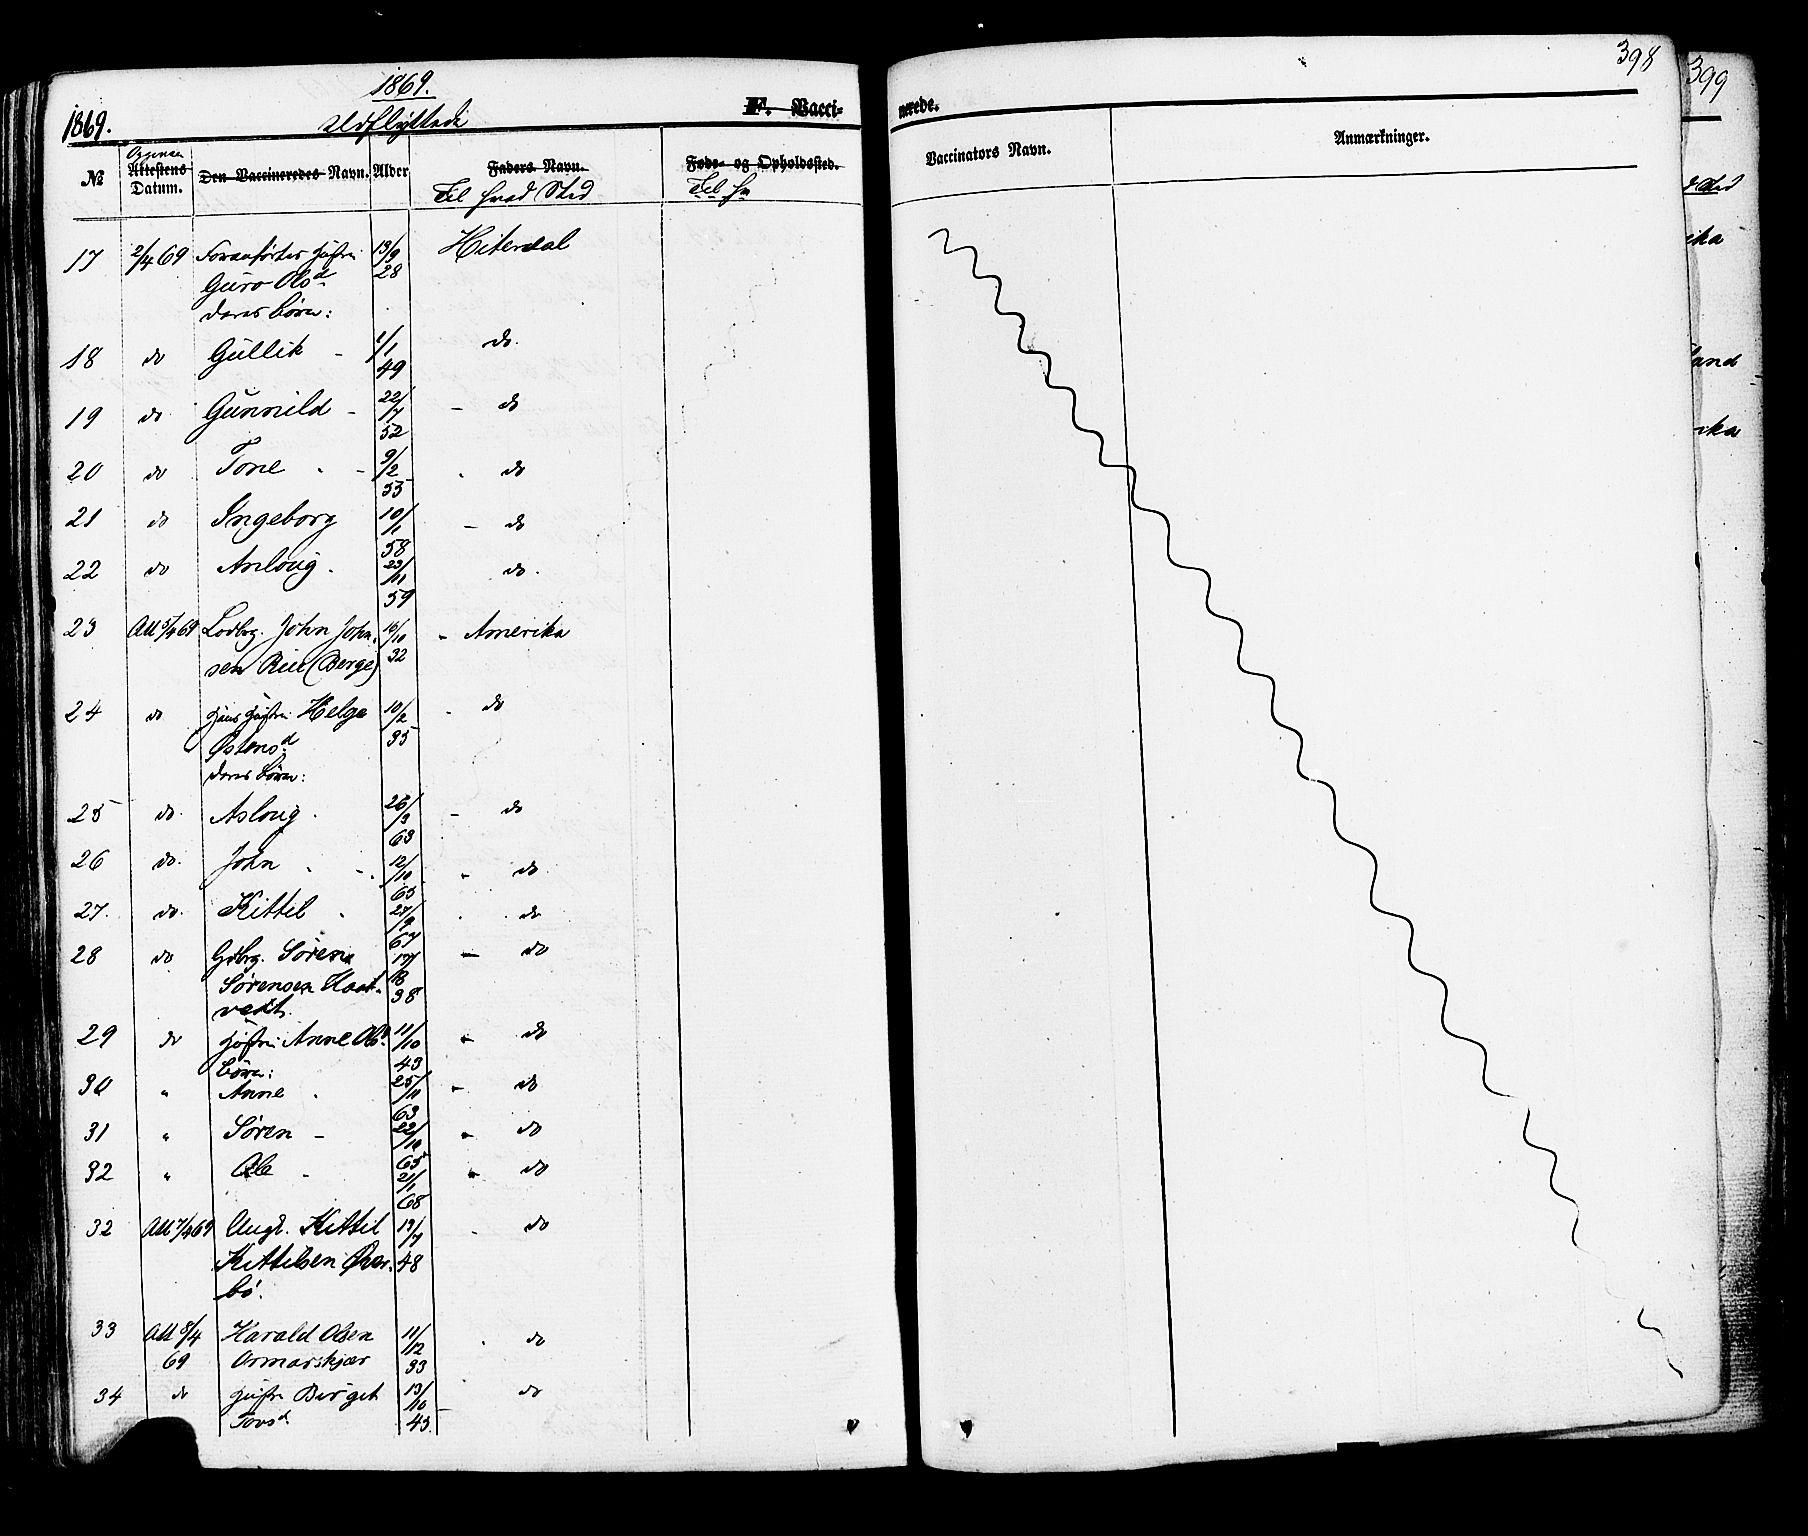 SAKO, Hjartdal kirkebøker, F/Fa/L0009: Ministerialbok nr. I 9, 1860-1879, s. 398